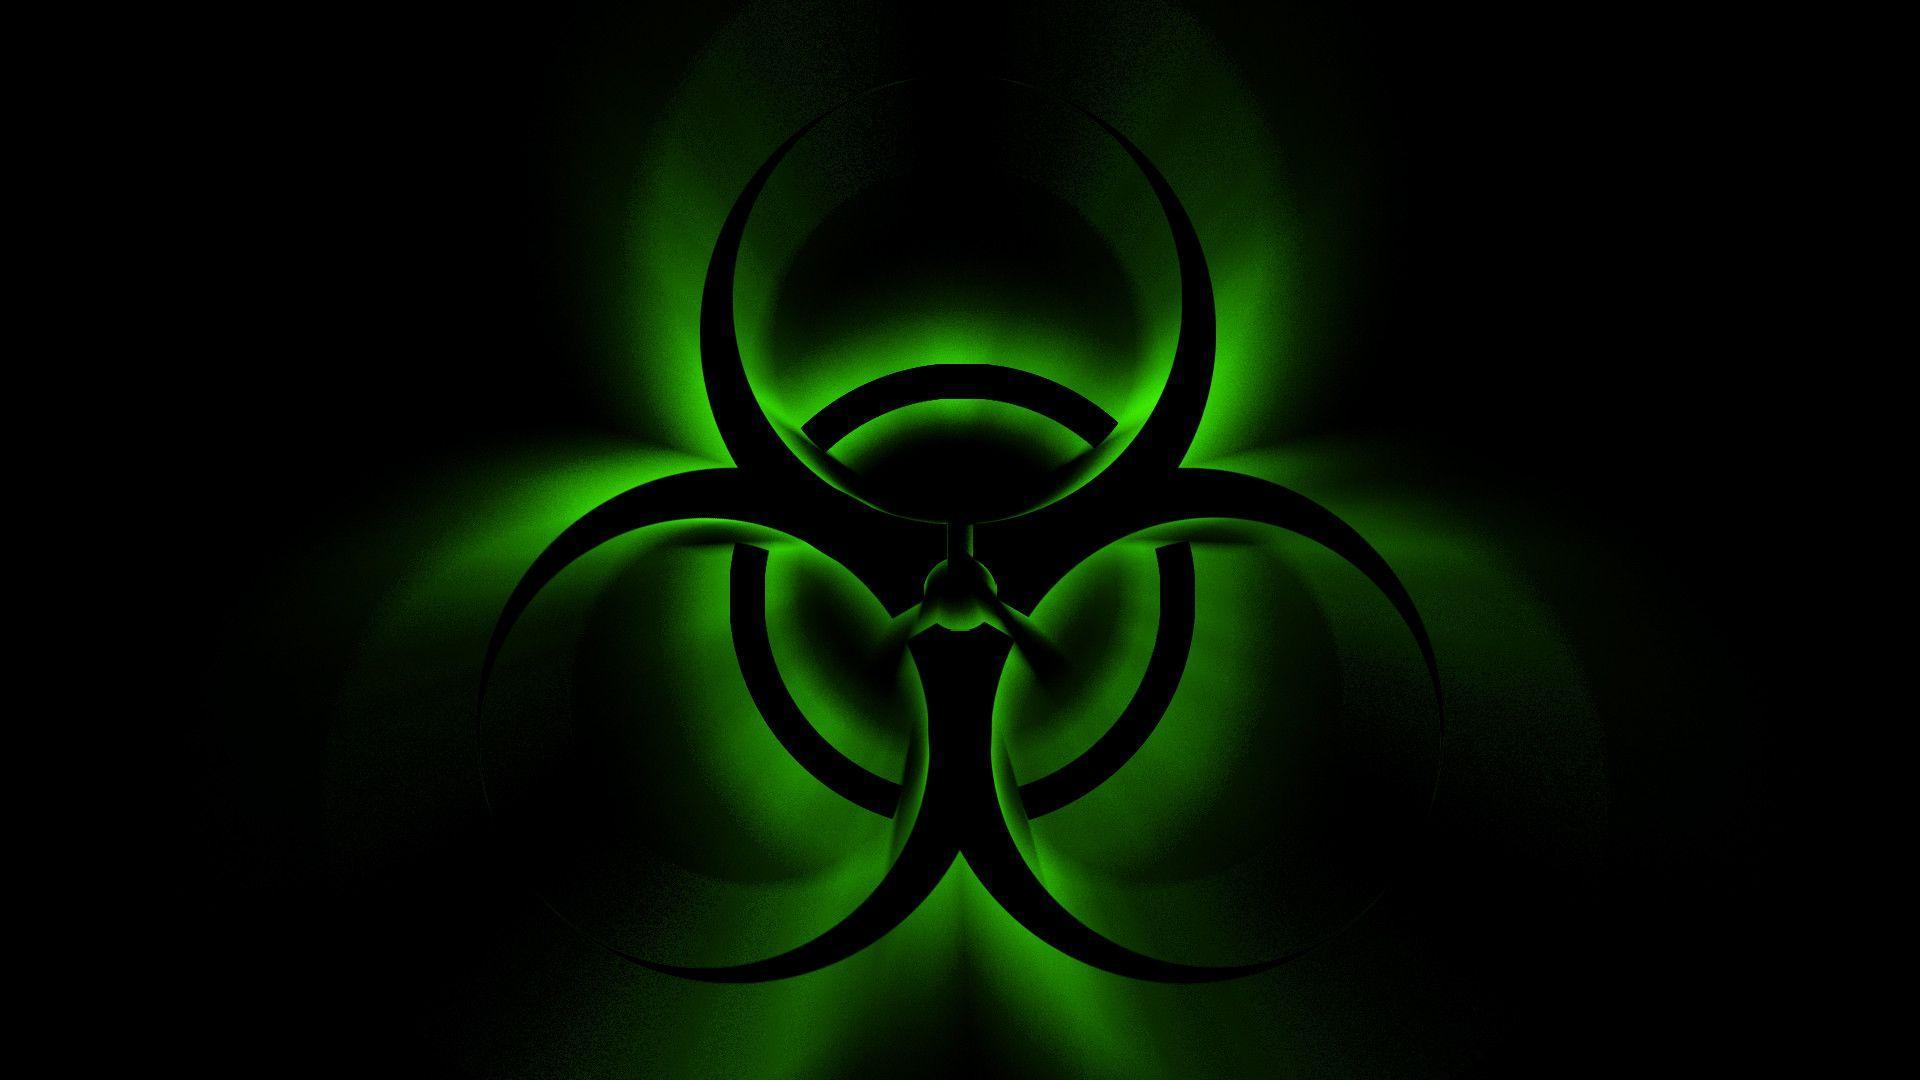 biohazard symbol wallpapers wallpaper cave. Black Bedroom Furniture Sets. Home Design Ideas